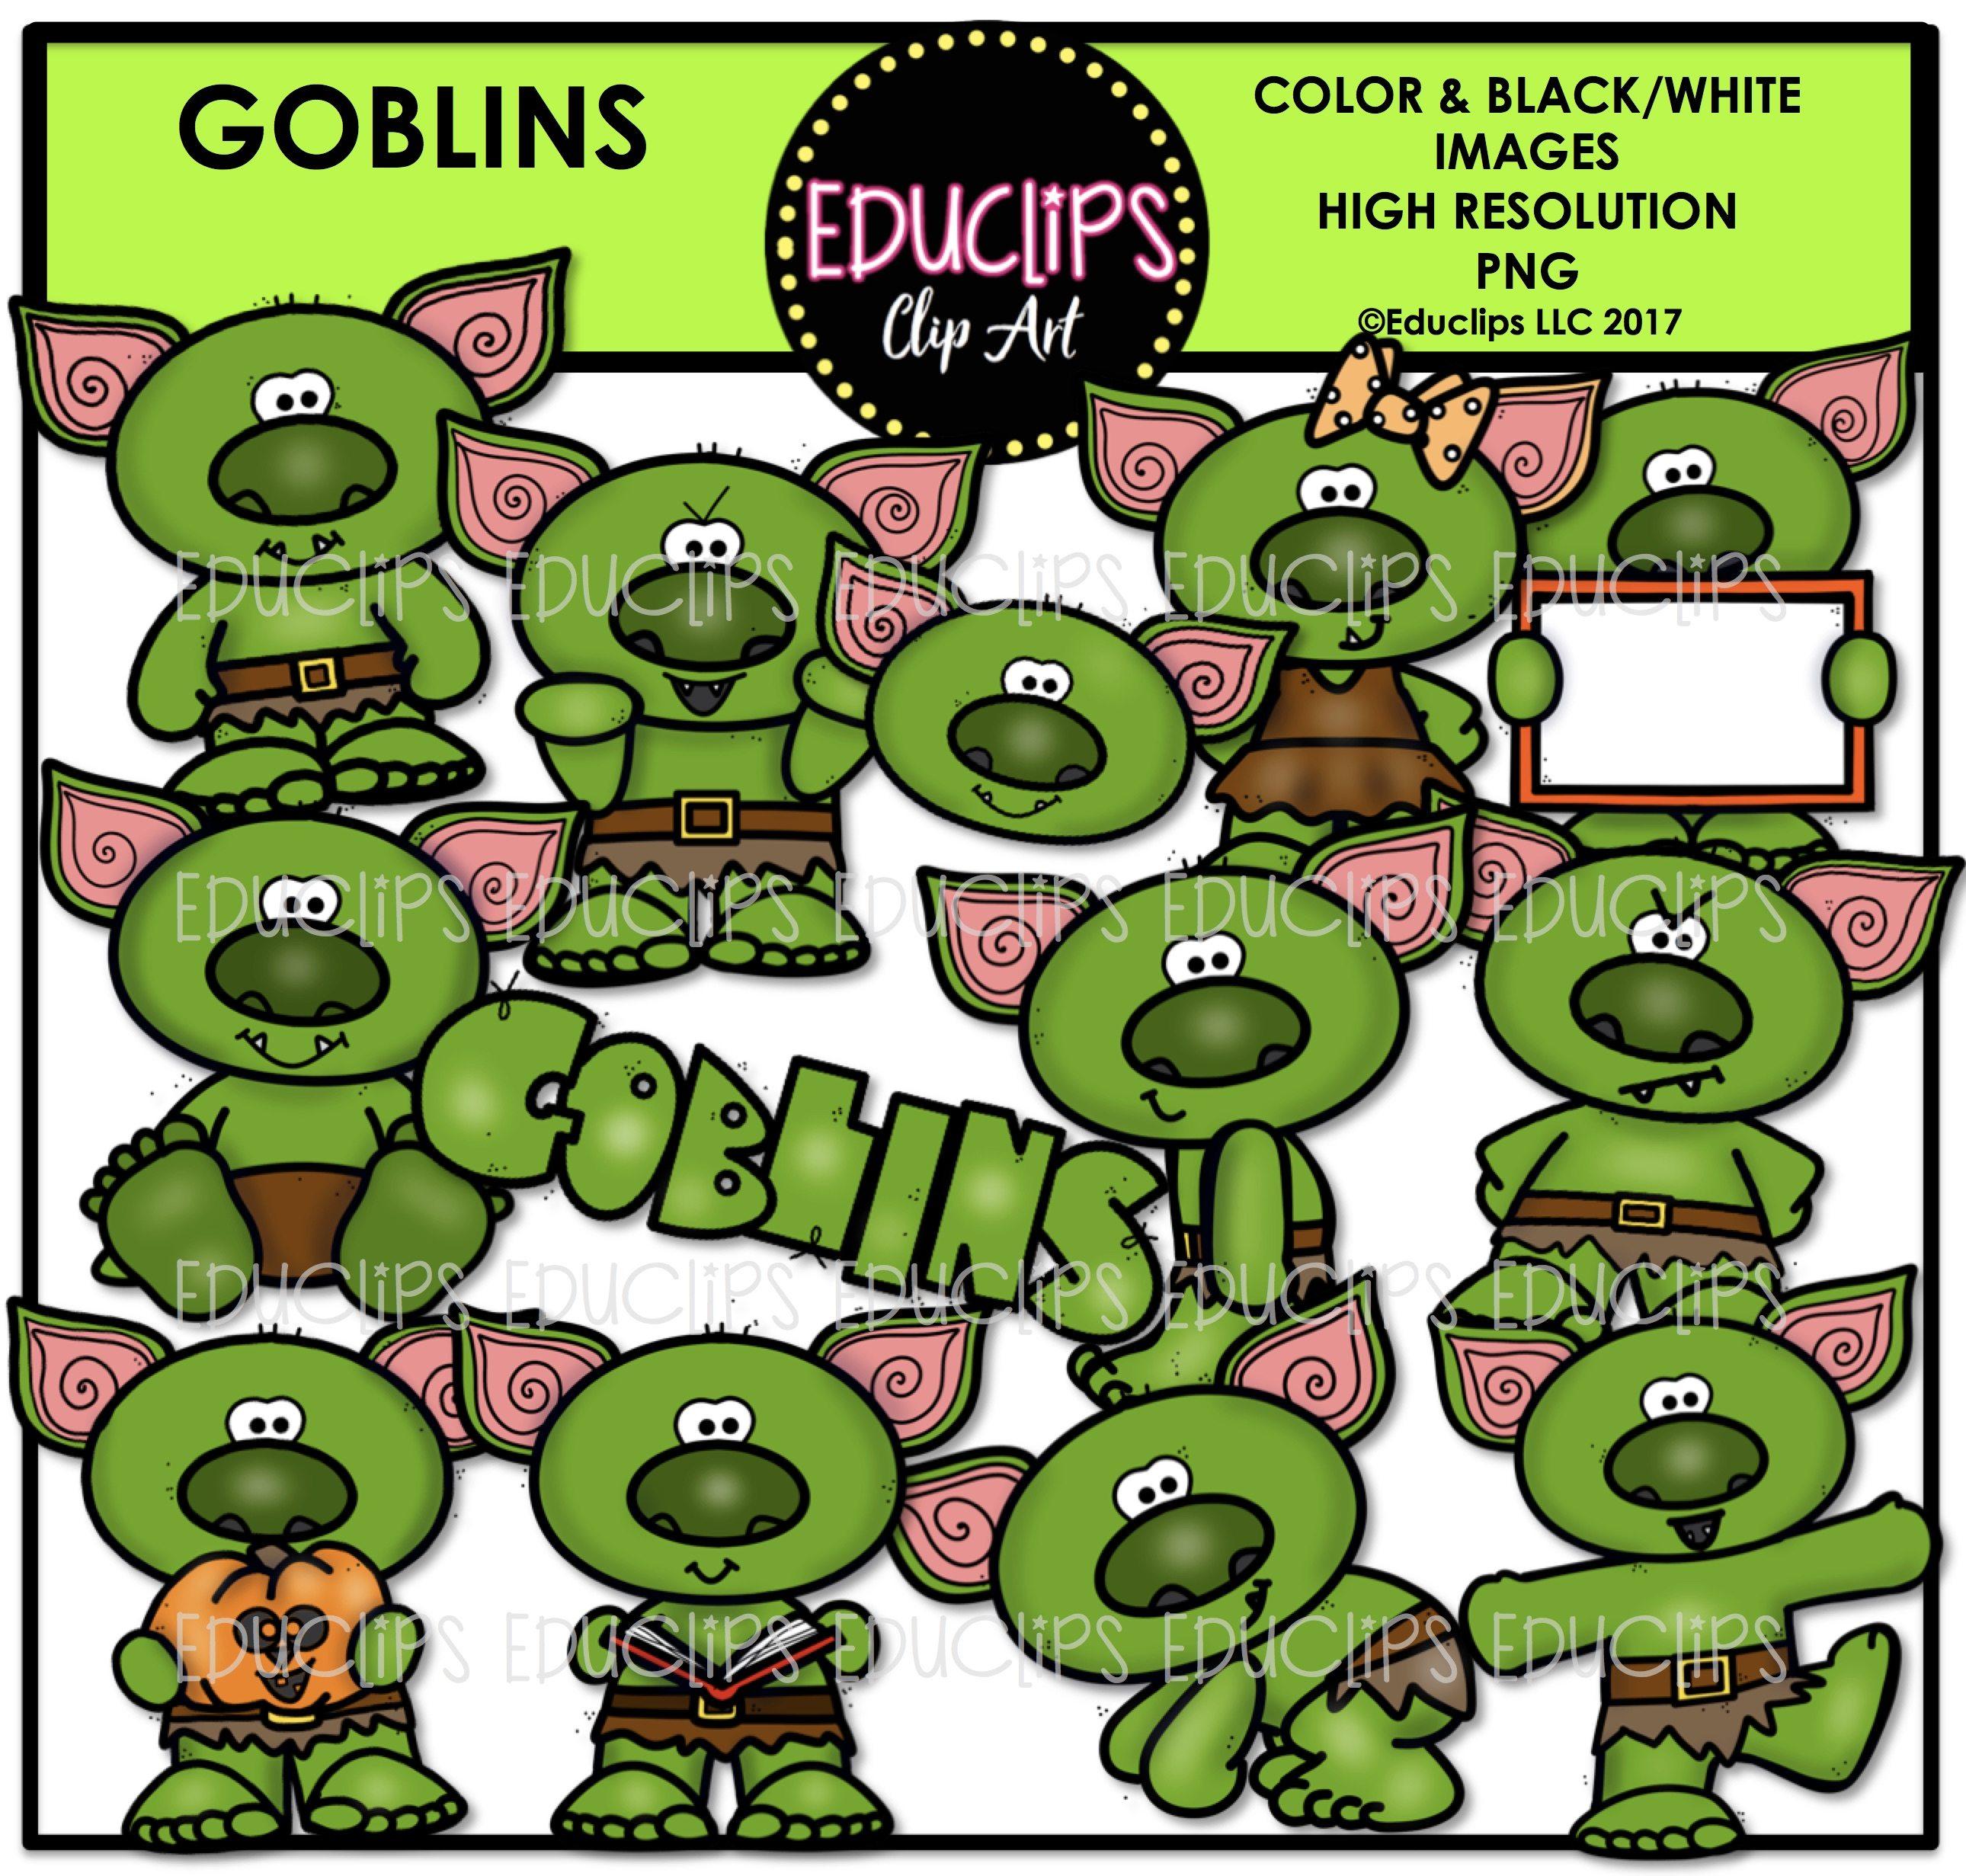 Creepy halloween clip art. Cabbage clipart educlips